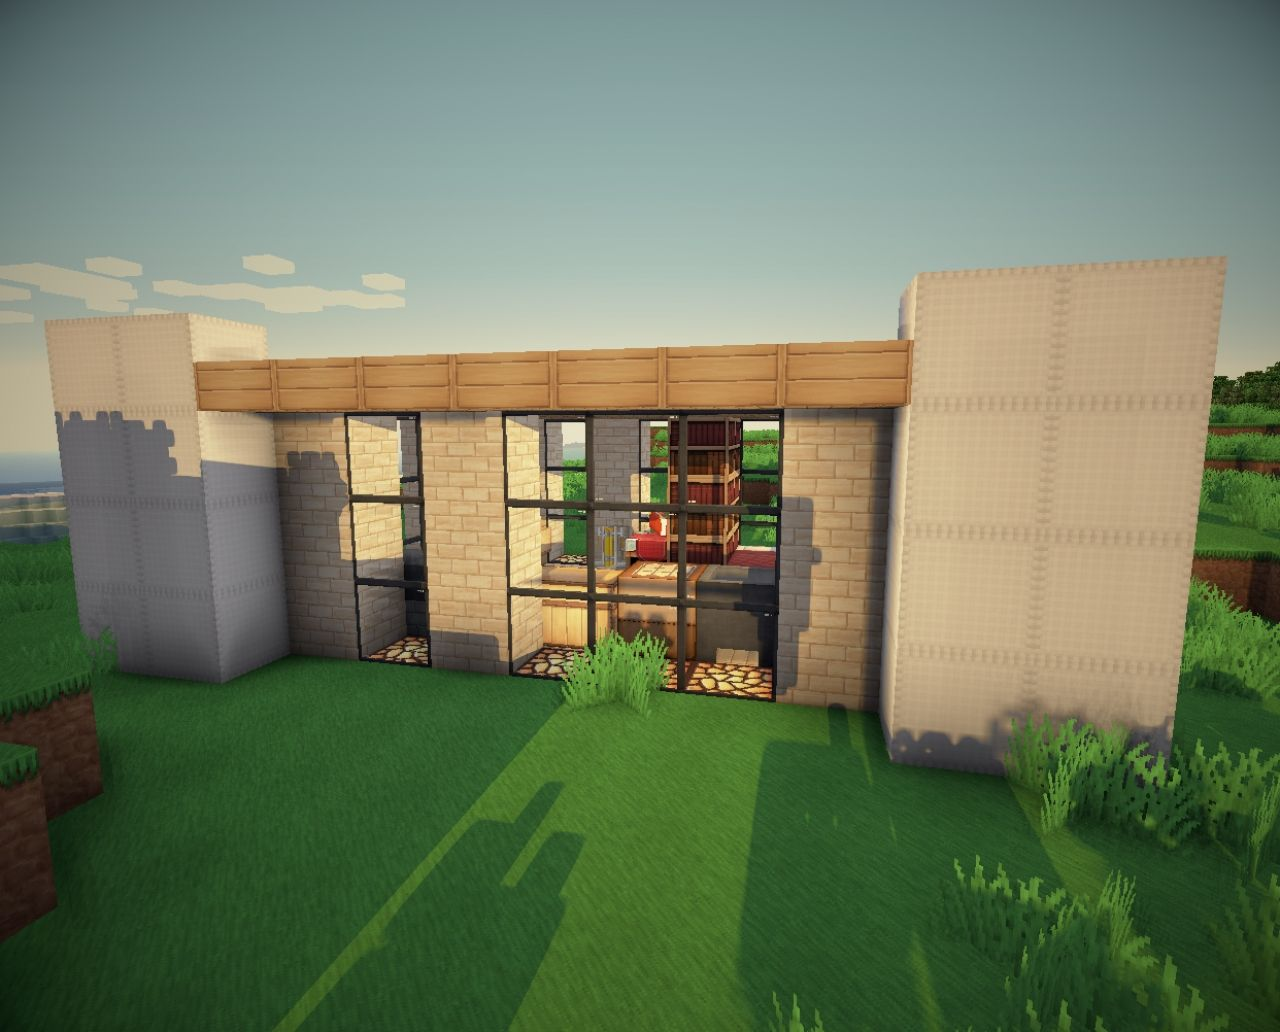 SUP BSI Horacek's modern house - ecreation, Furnitured ... - ^